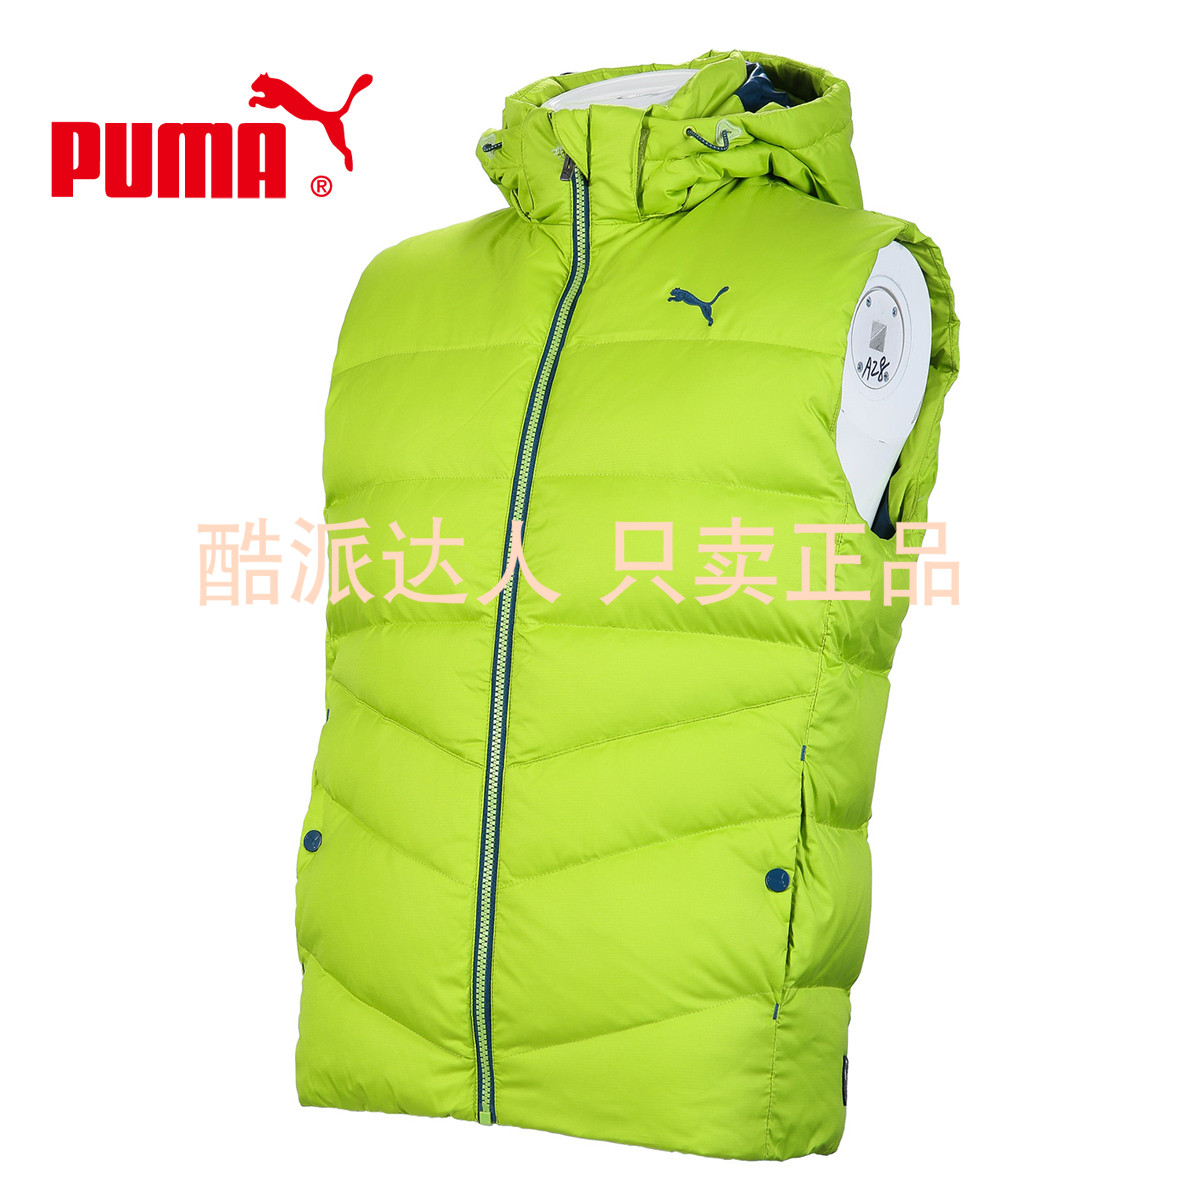 Спортивный пуховик Puma 2014PUMA 83084705/10 830847